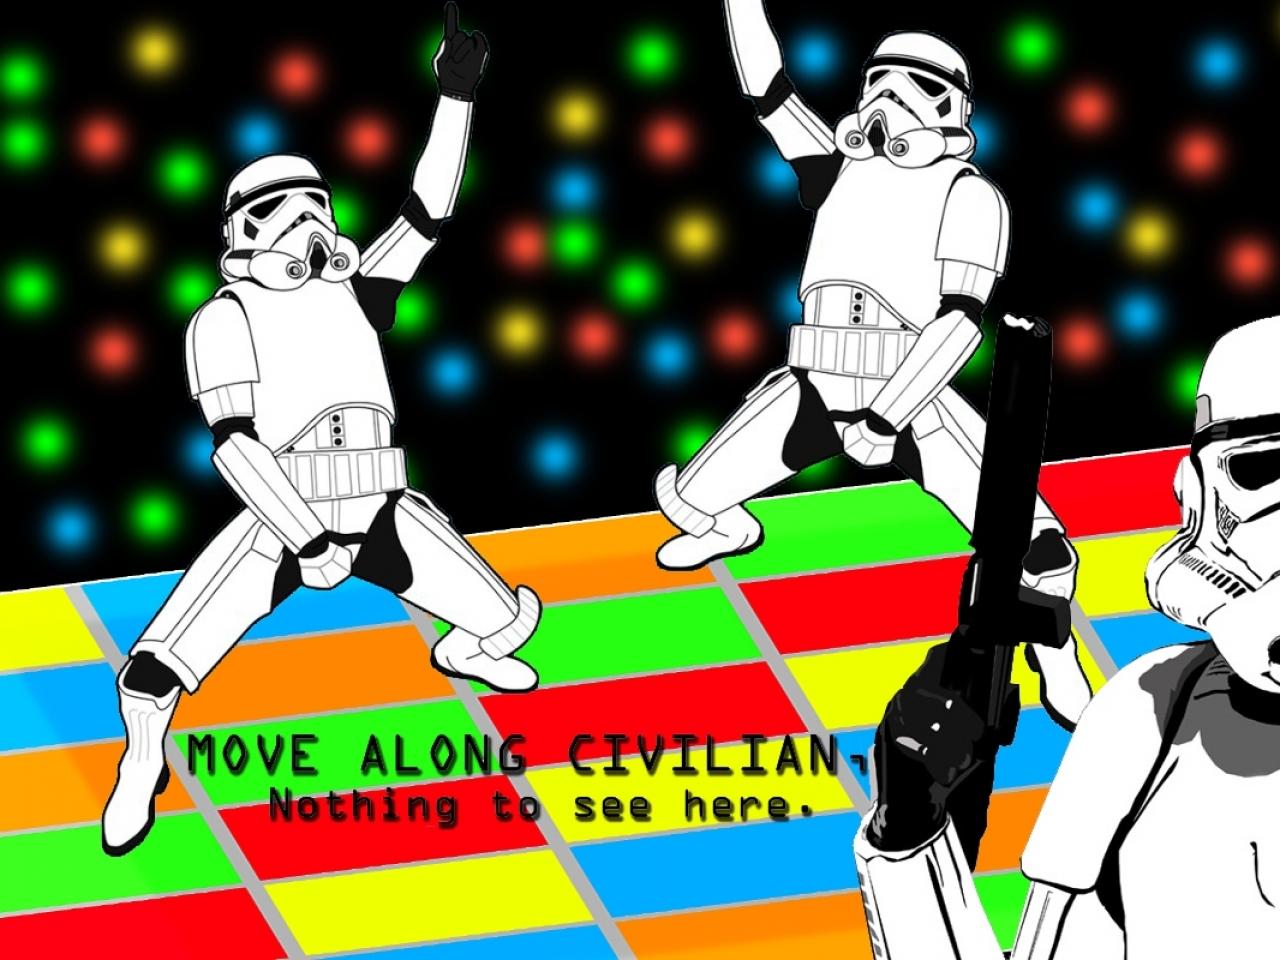 humor 1280x800 wallpaper Wallpaper Wallpapers Download 1280x960